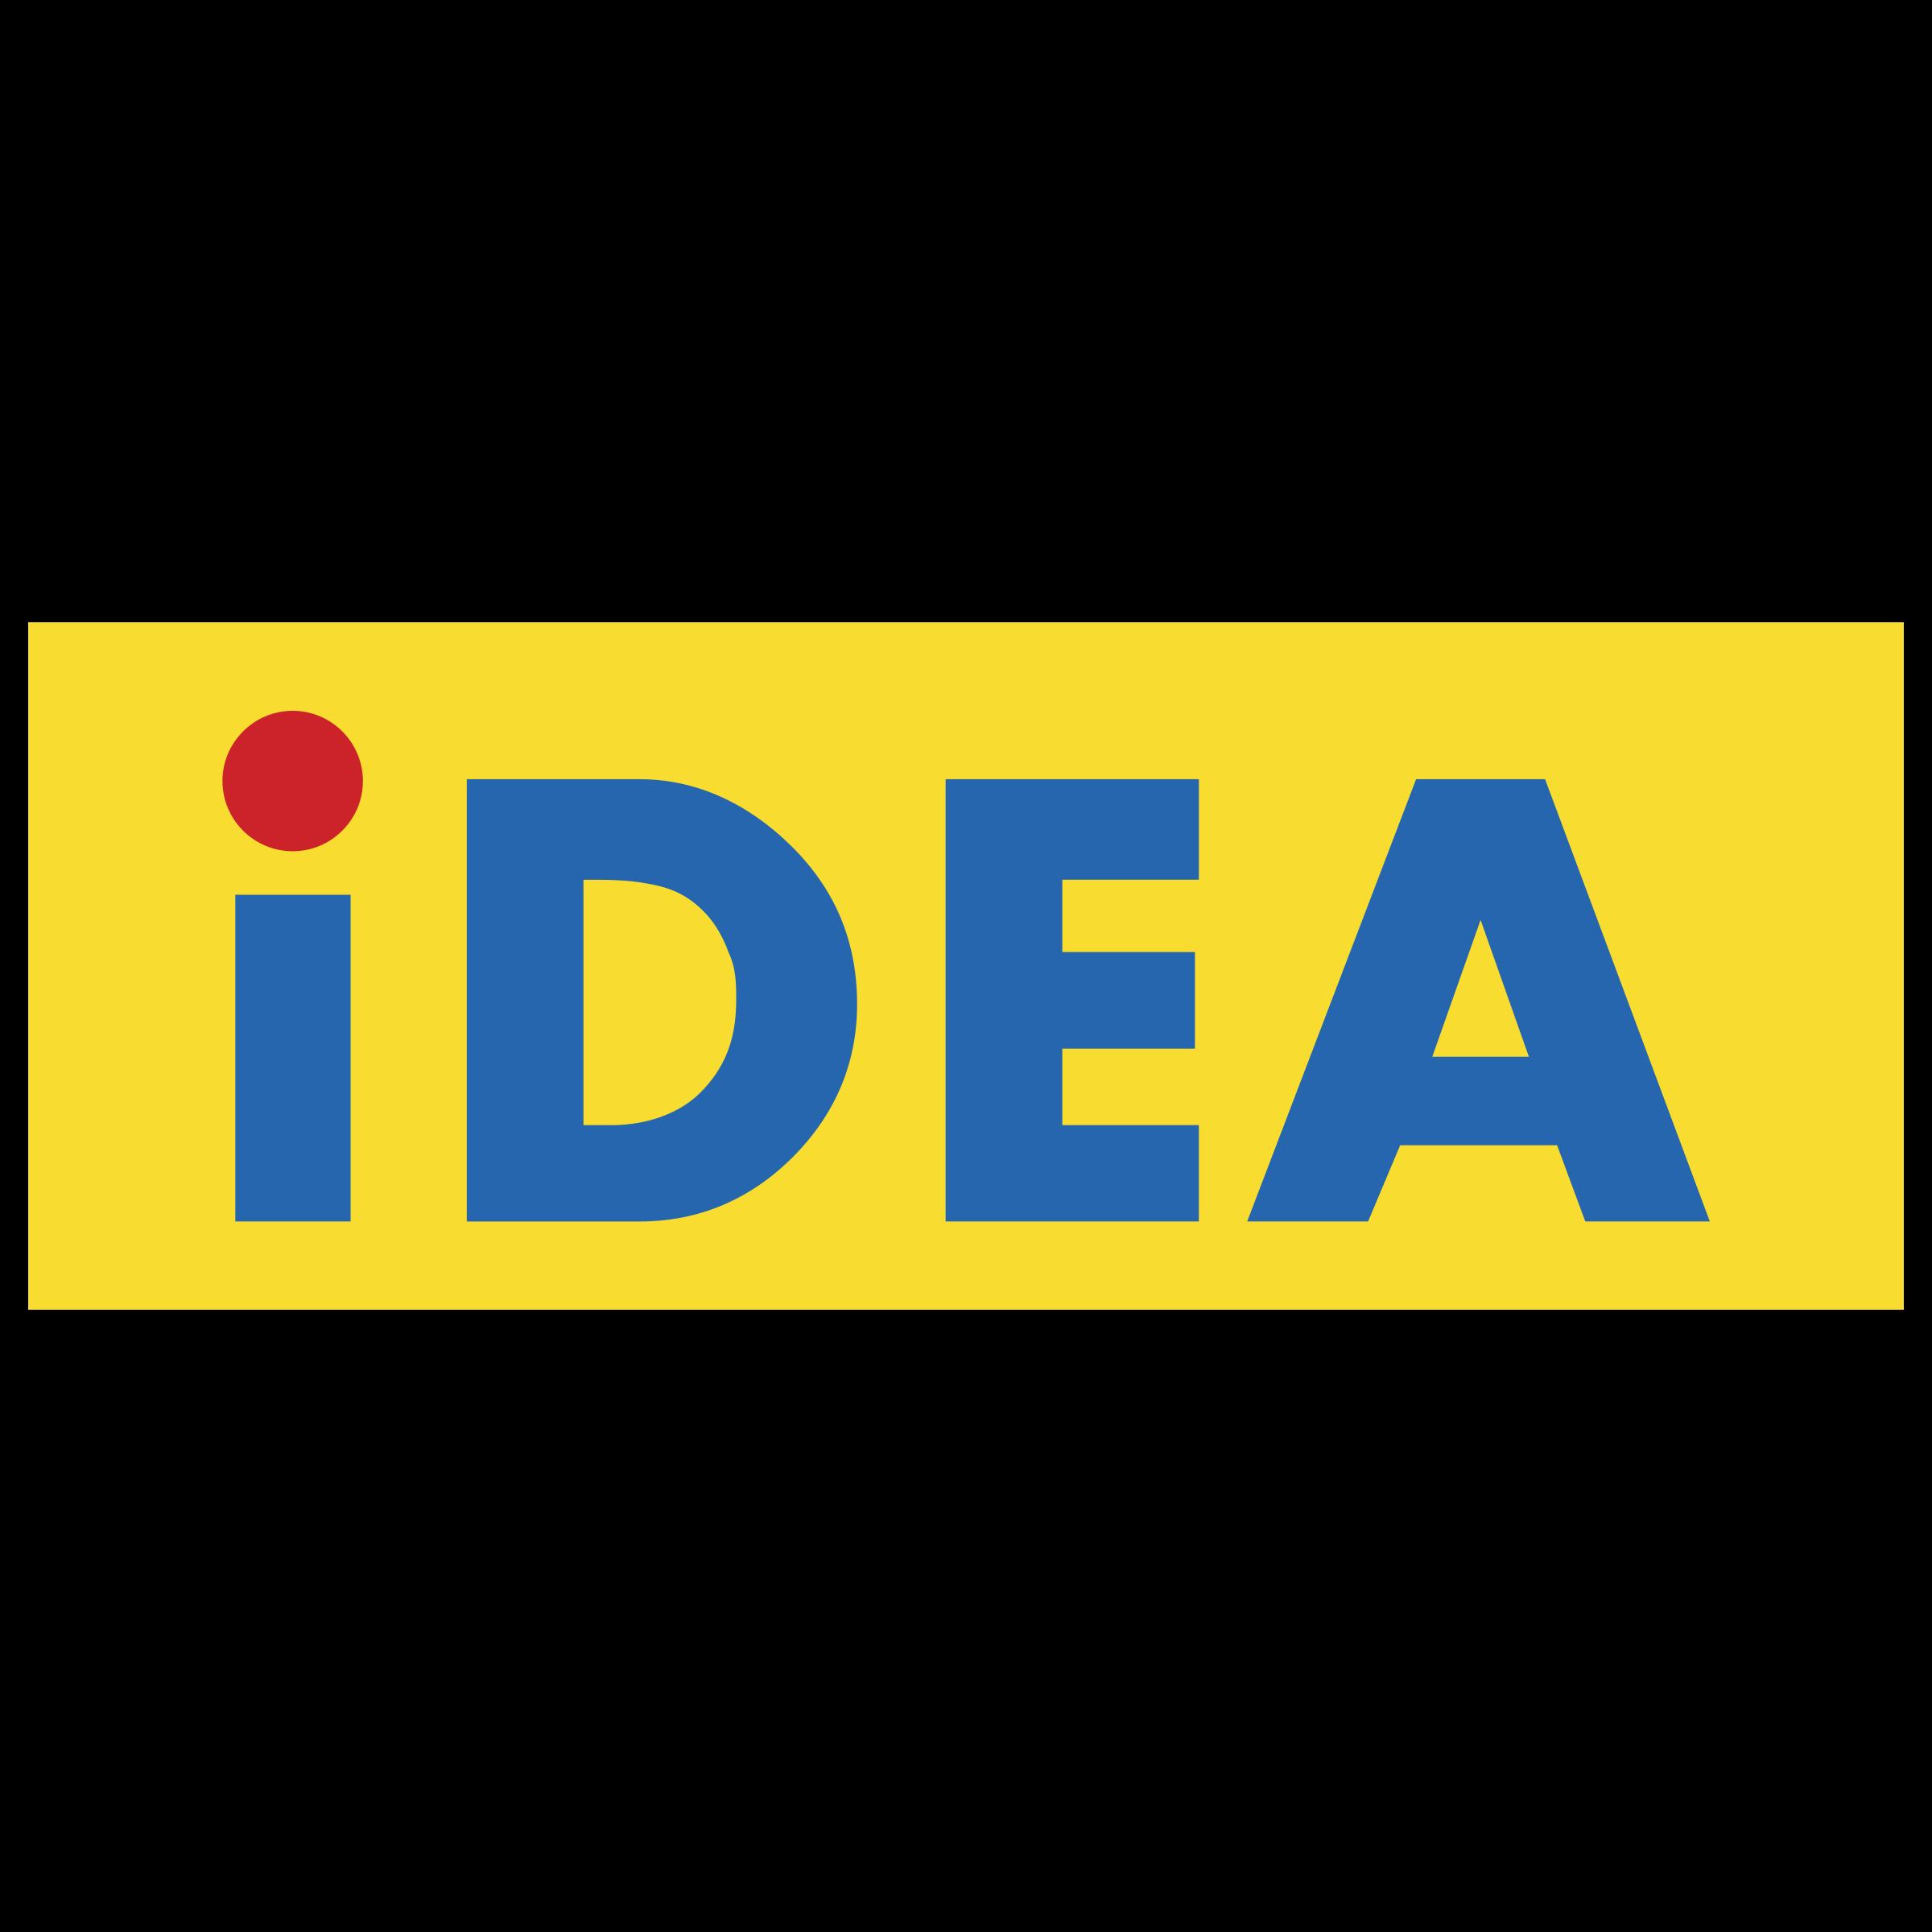 Idea clipart logo vector. Png perfect remarkable ideas